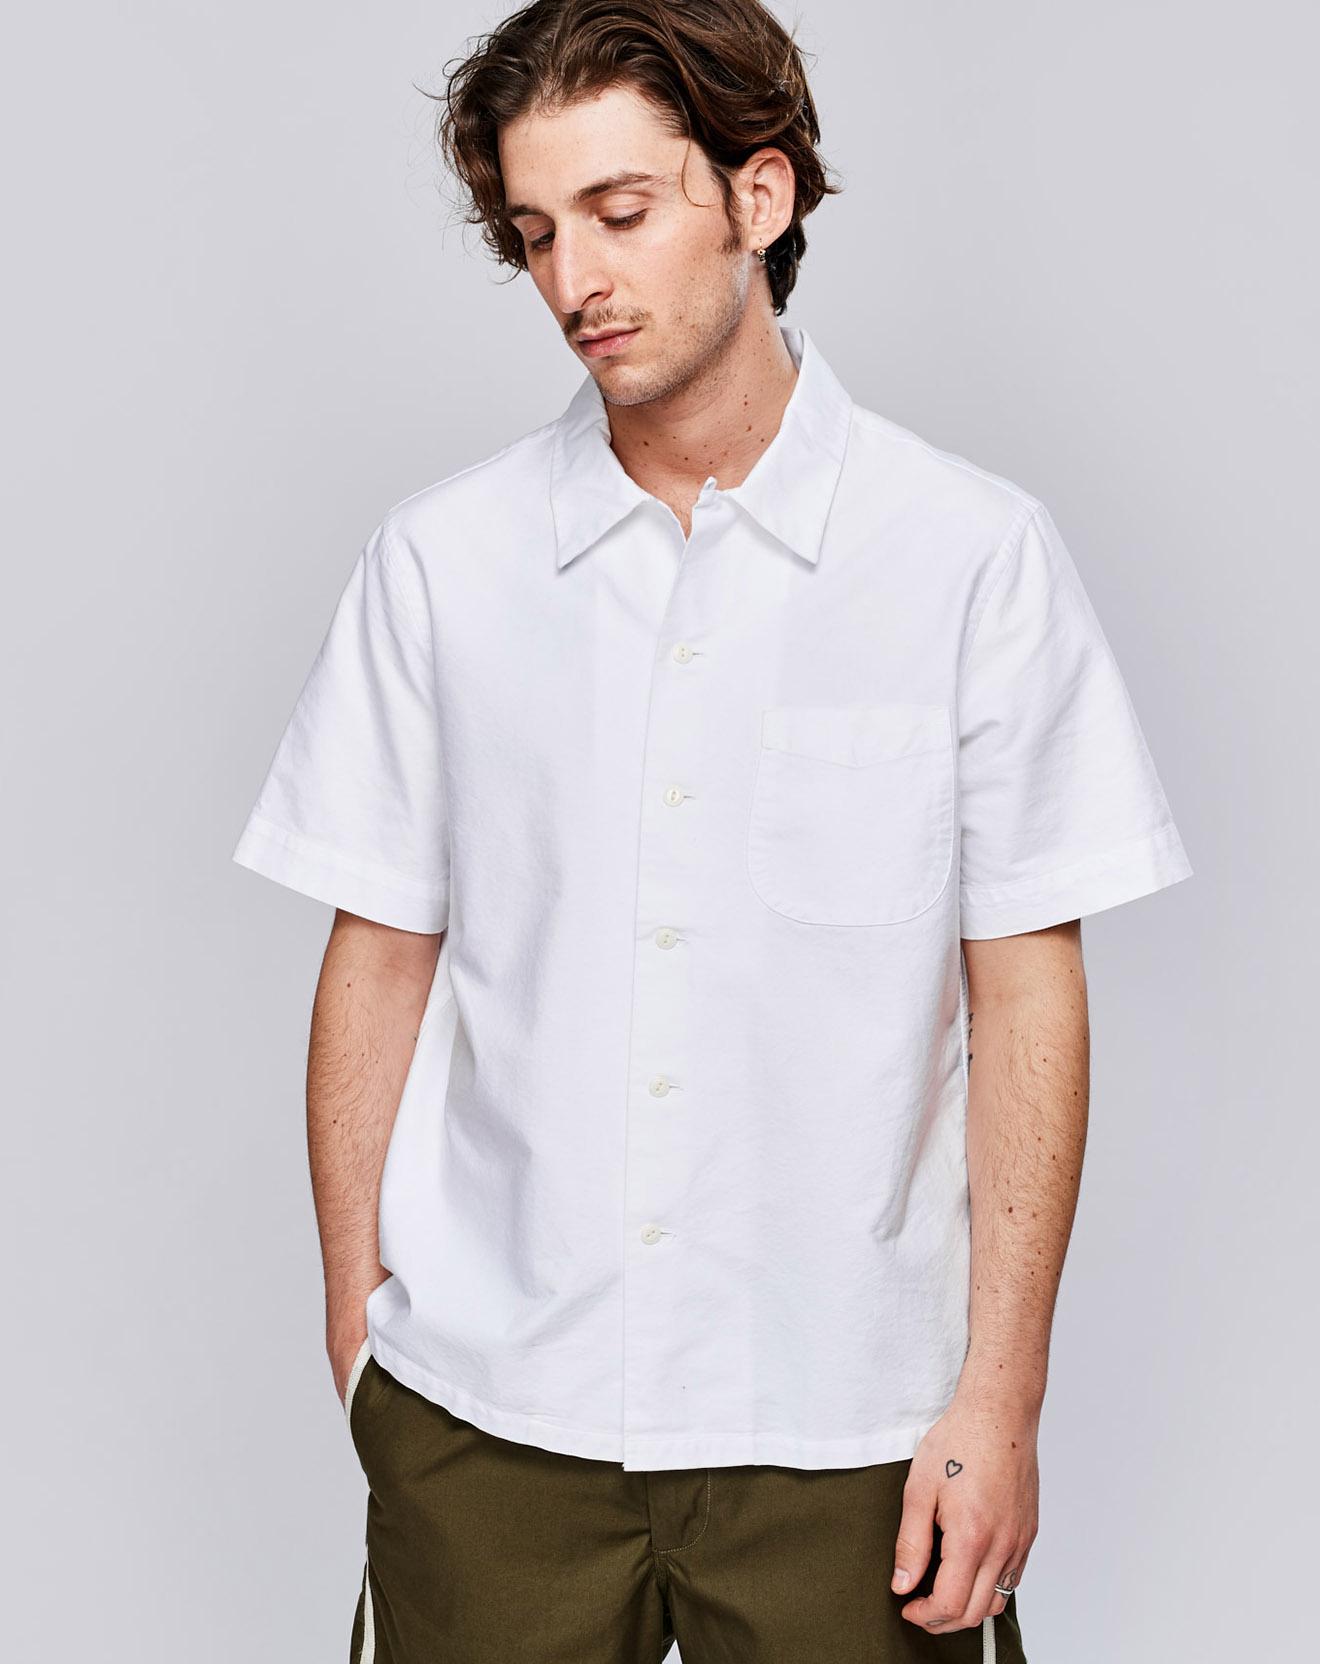 Chemise Gowai blanche